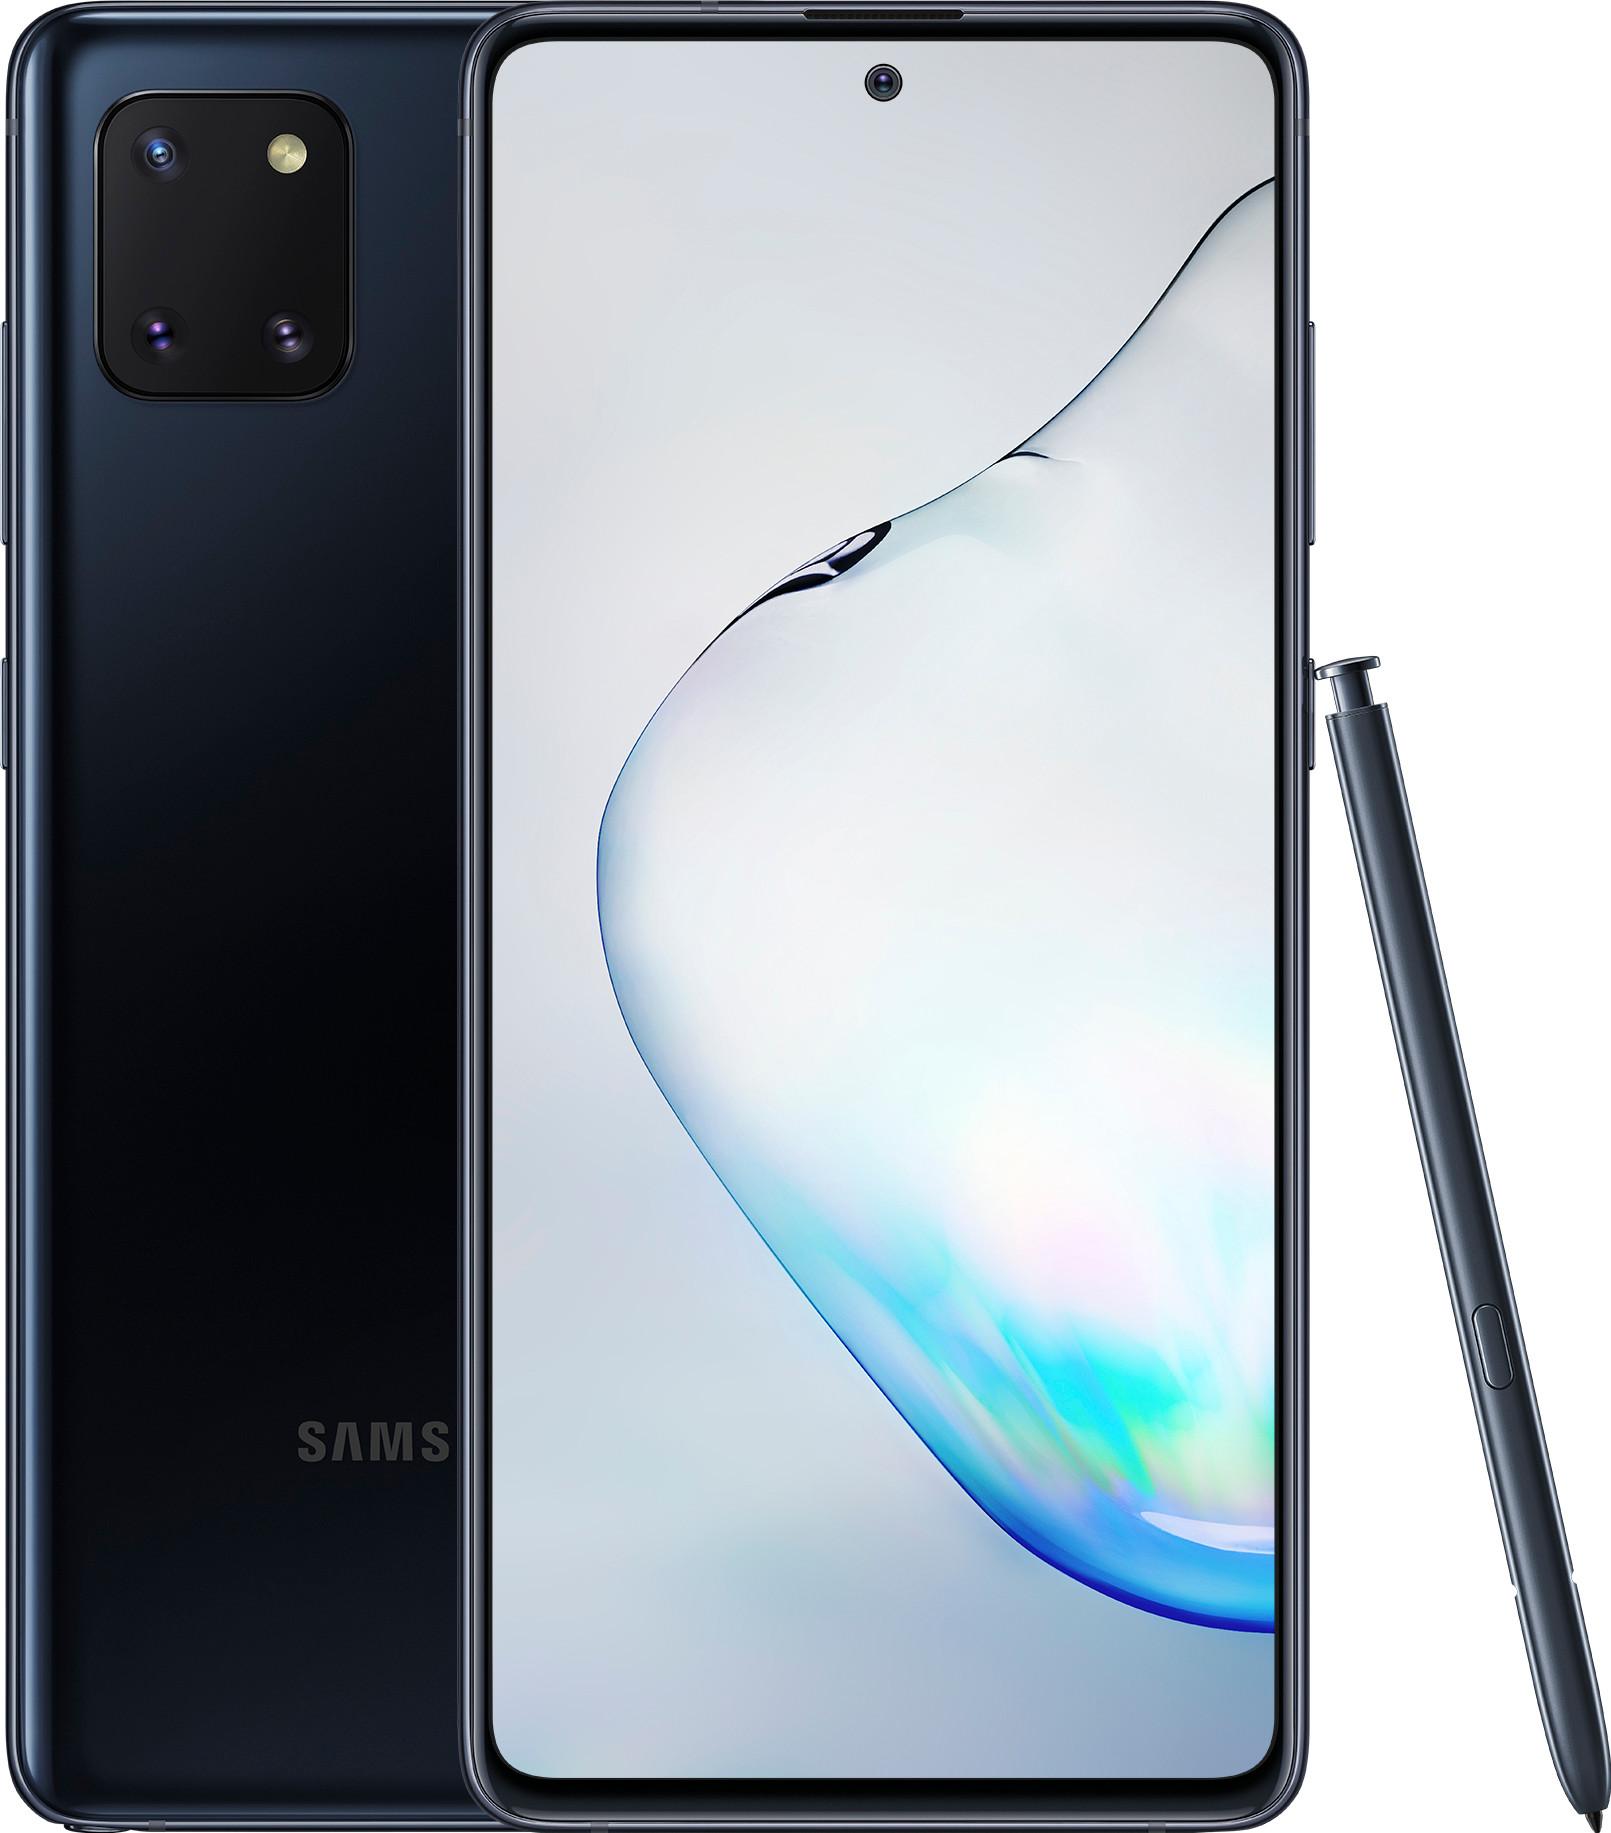 Reparatie Galaxy Note 10 Lite  scherm reparatie